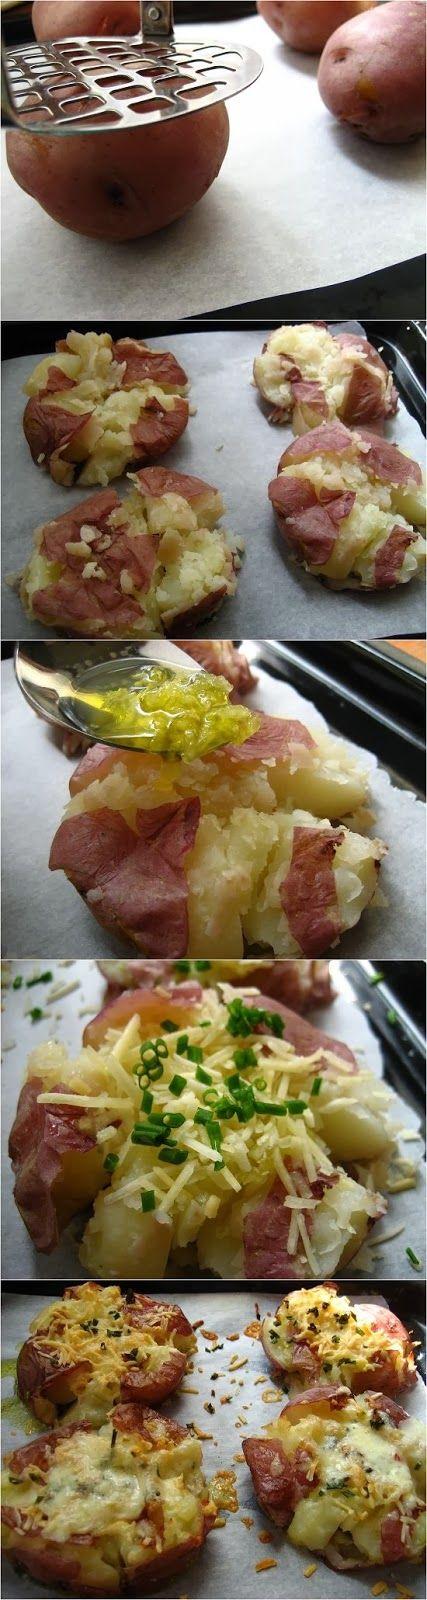 Yummy Recipes: Crushed Potatoes recipe